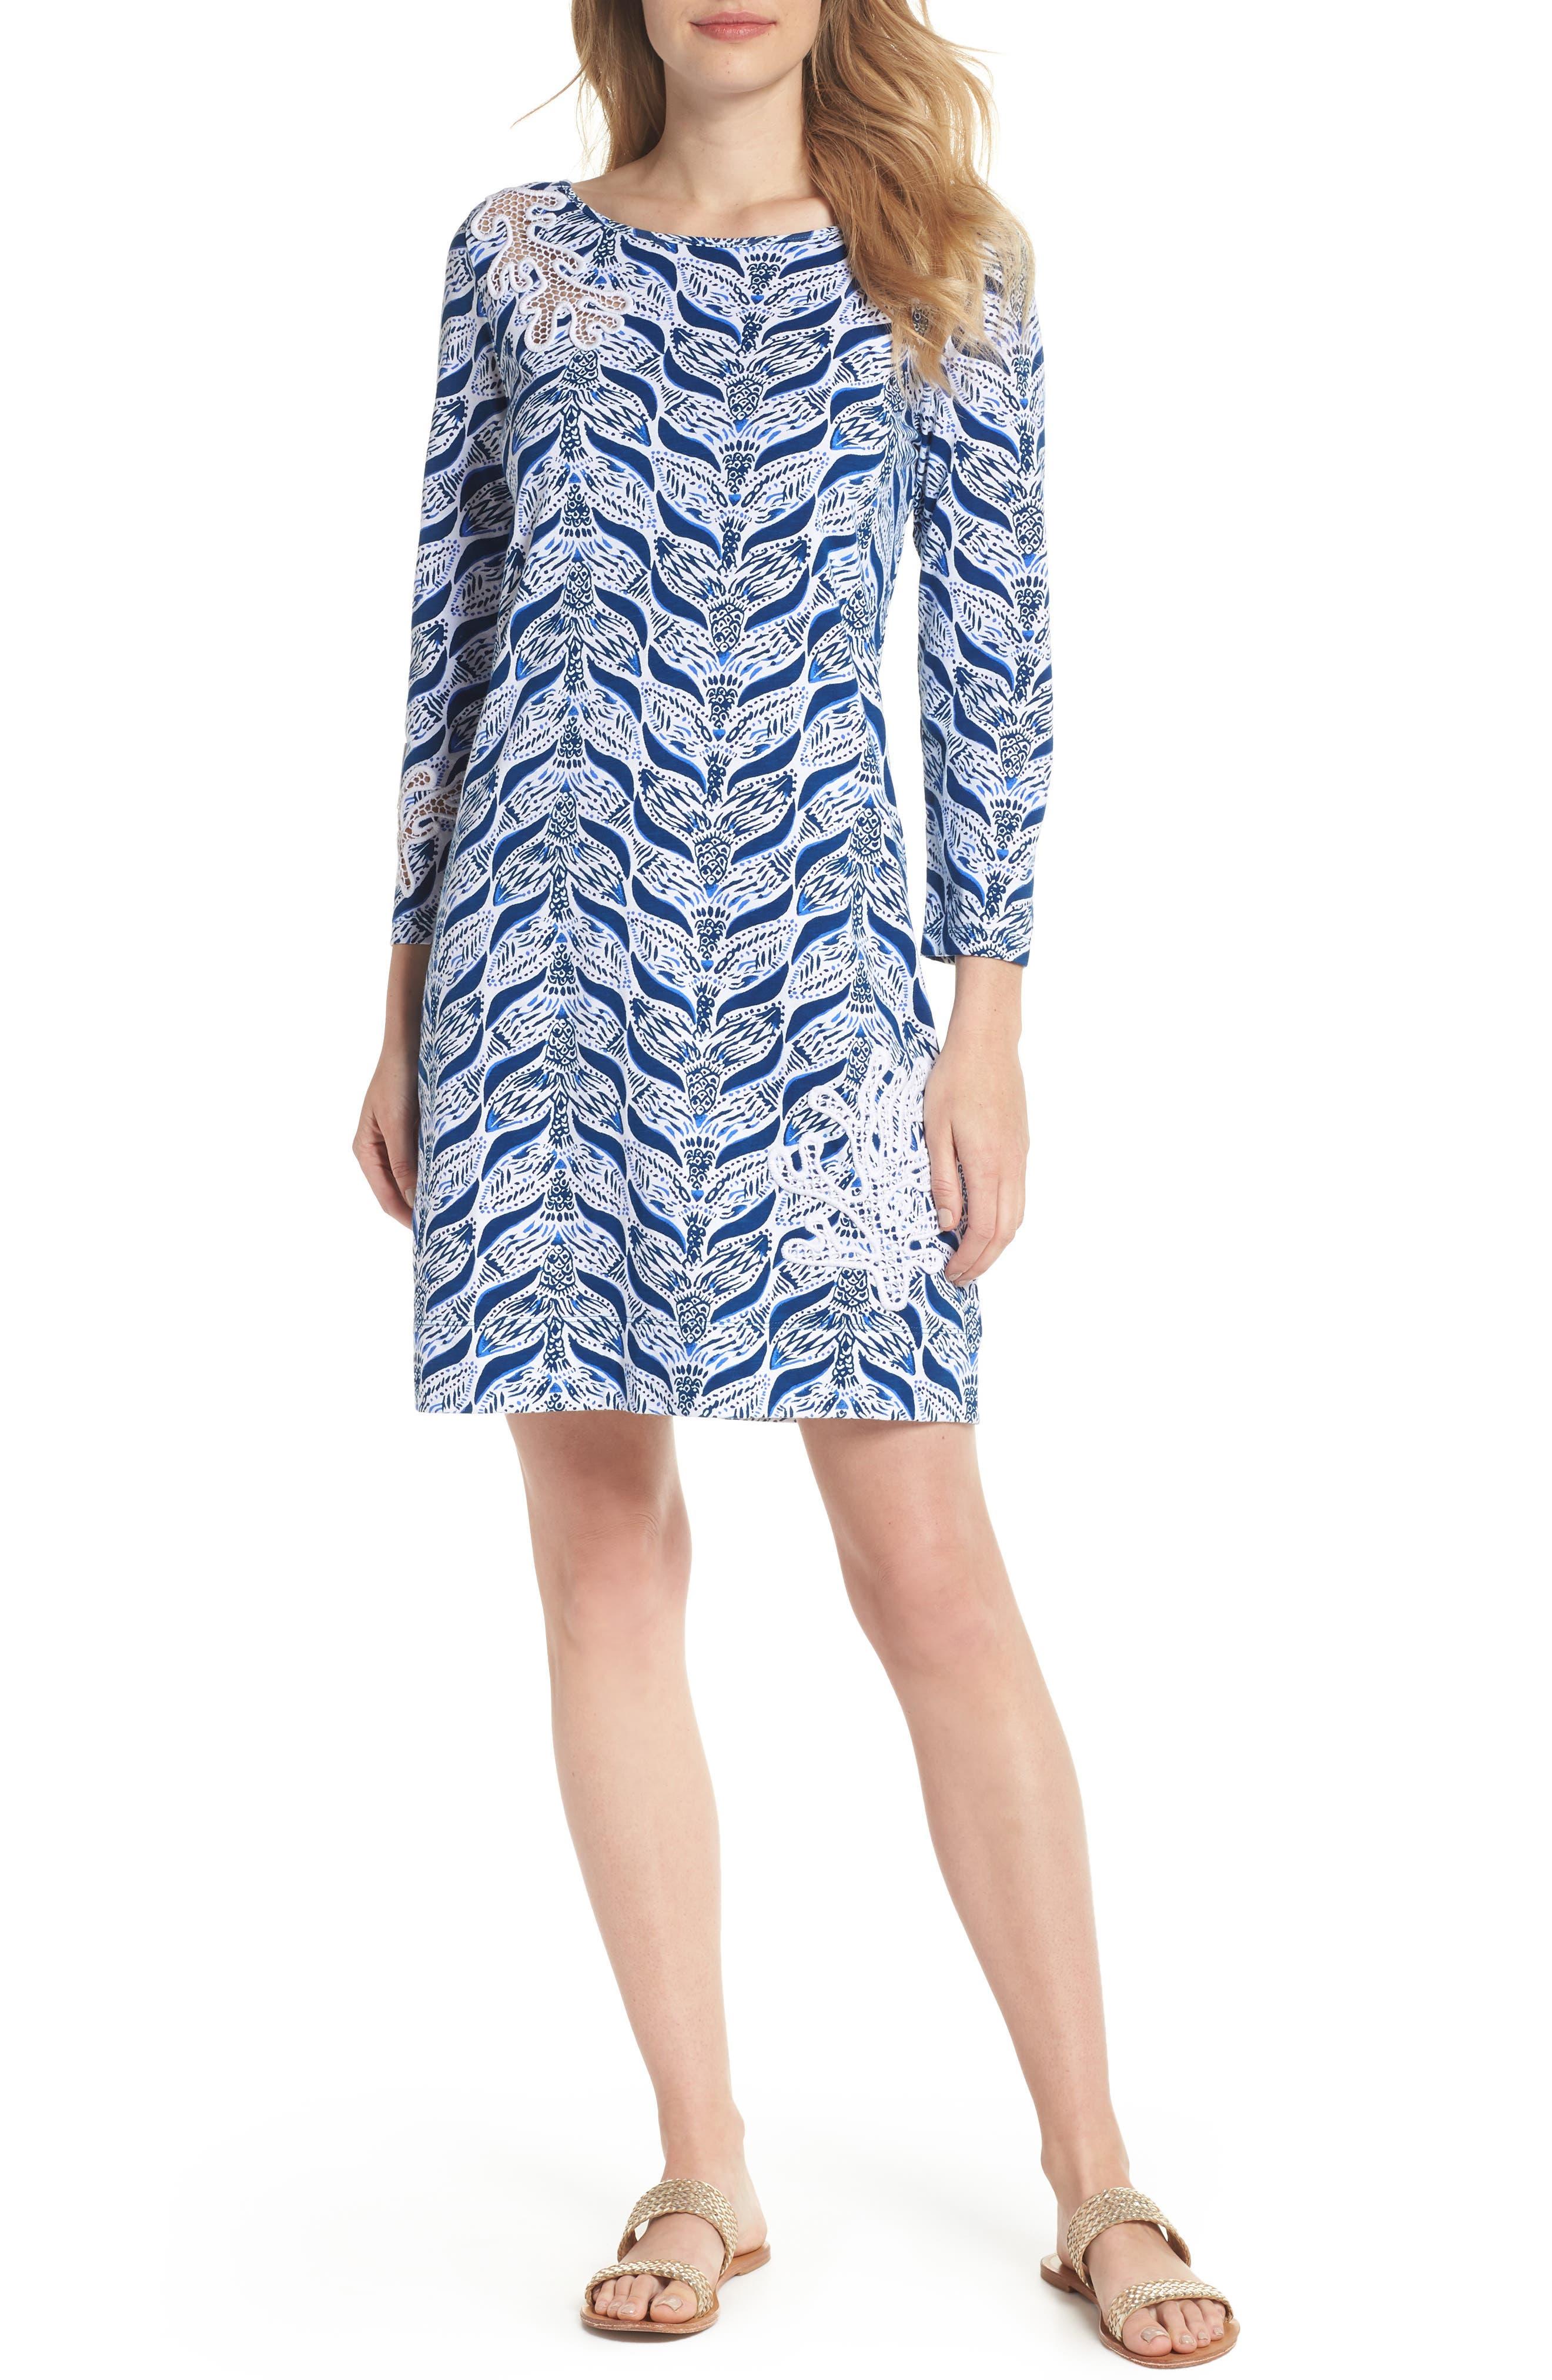 Marlowe T-Shirt Dress,                         Main,                         color, Resort White A Mermaids Tail